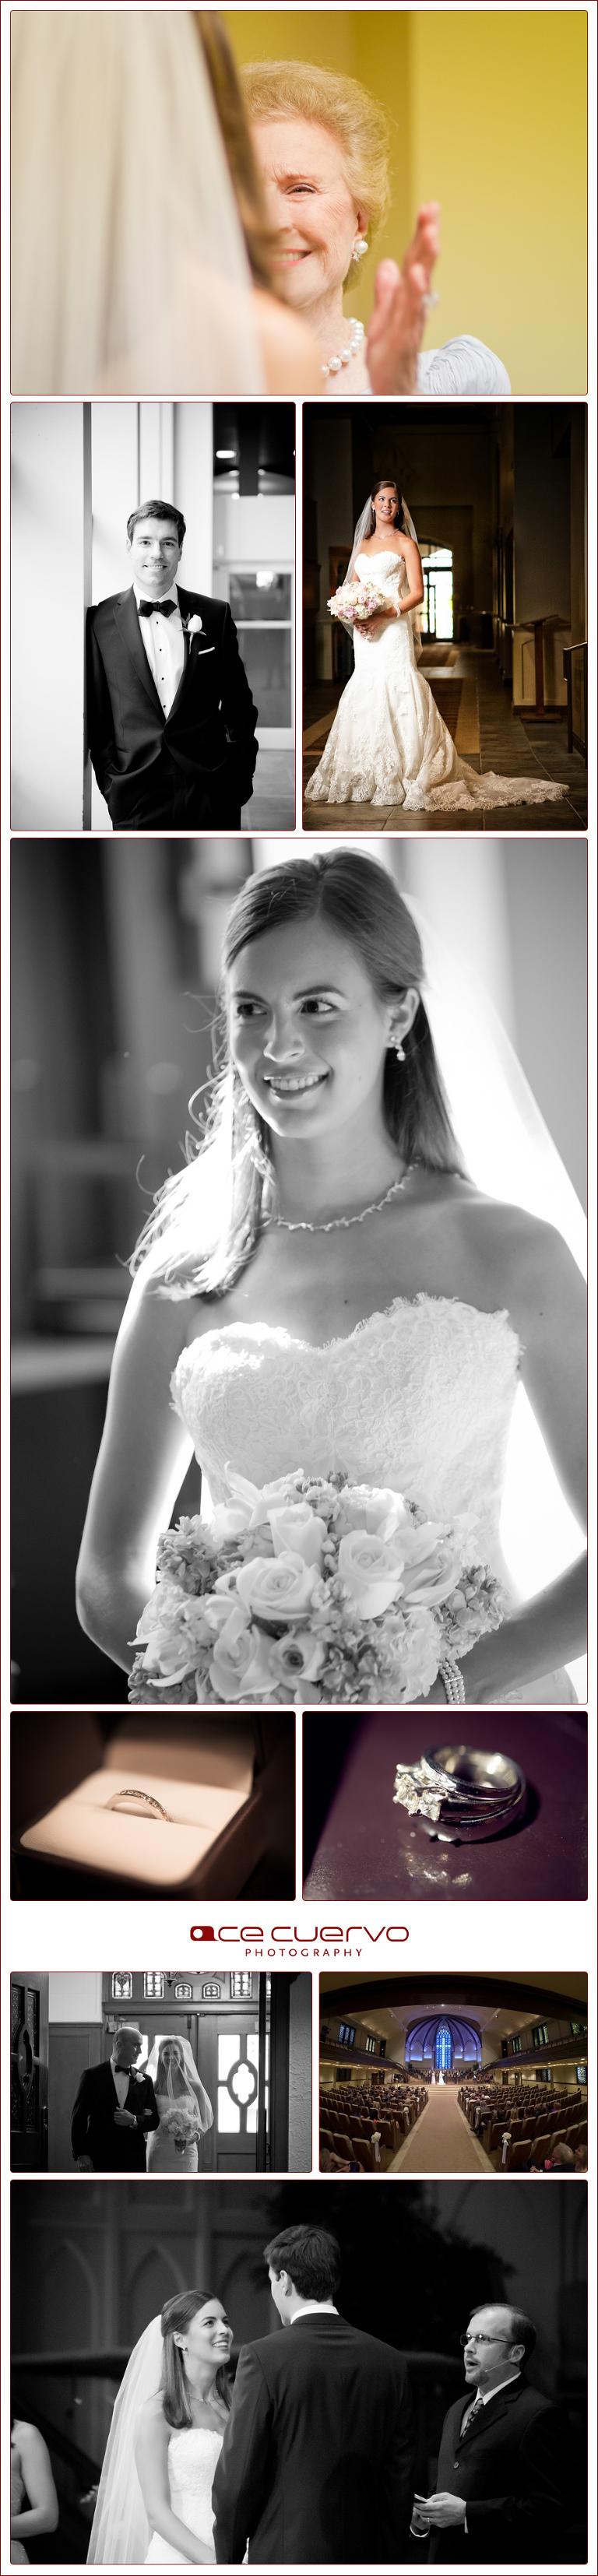 Ace Cuervo Photography, Tulsa Wedding Photography, The Summit